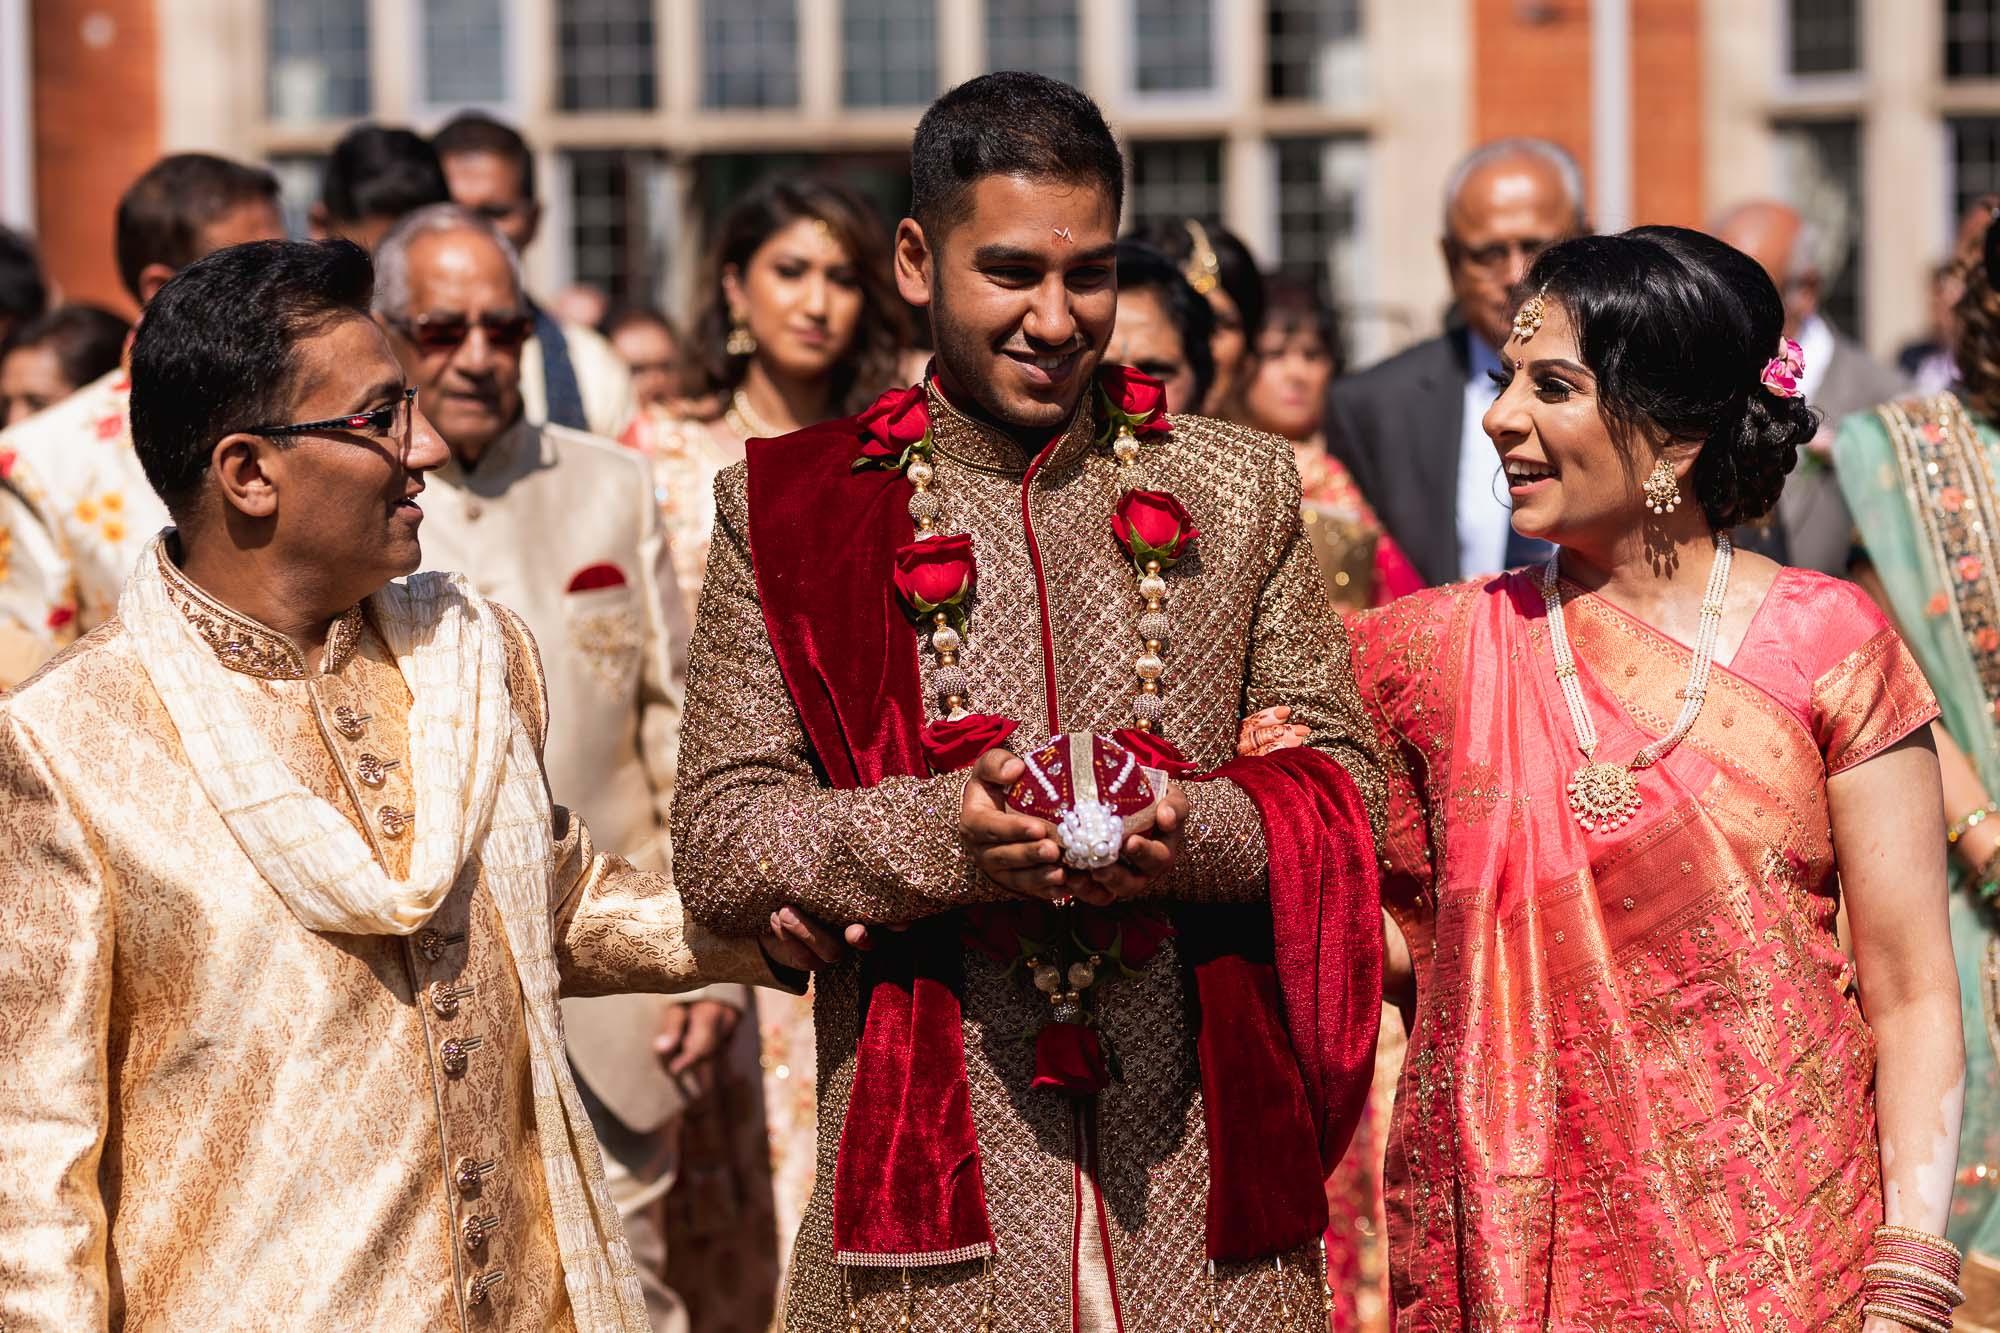 Dunchurch Park Hotel, Asian wedding photographer Midlands, jaan arrival